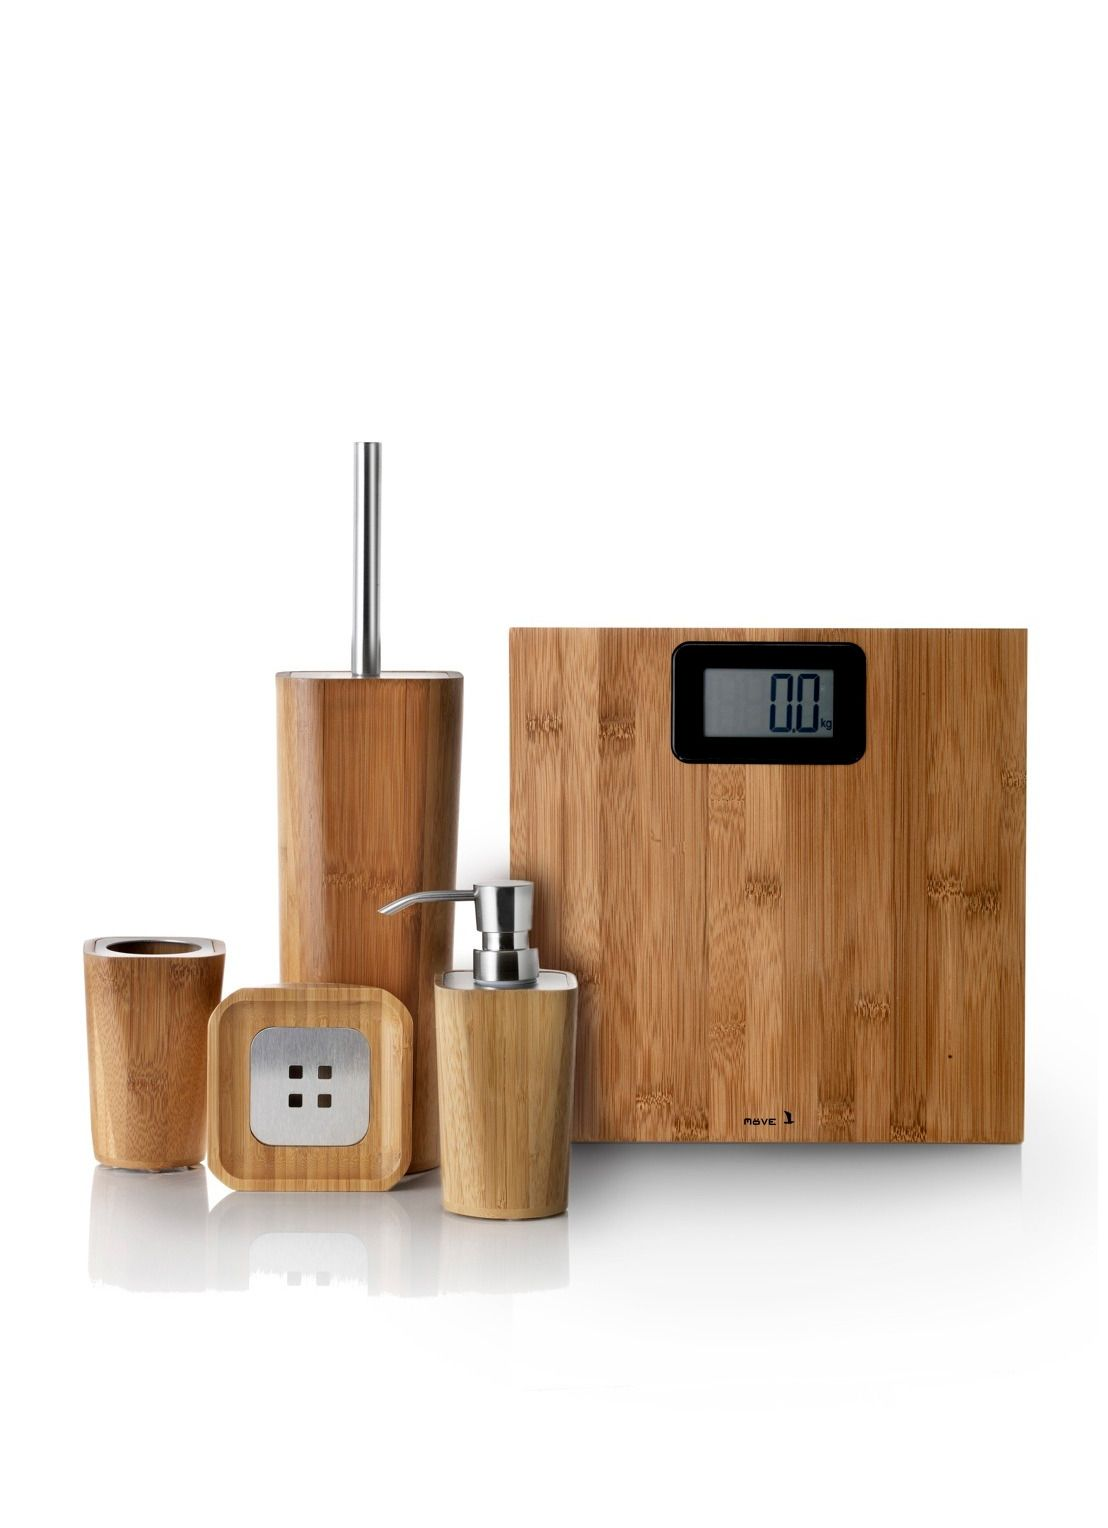 Badkamer accessoires | Bathrooms/Toilets/Showers | Pinterest ...